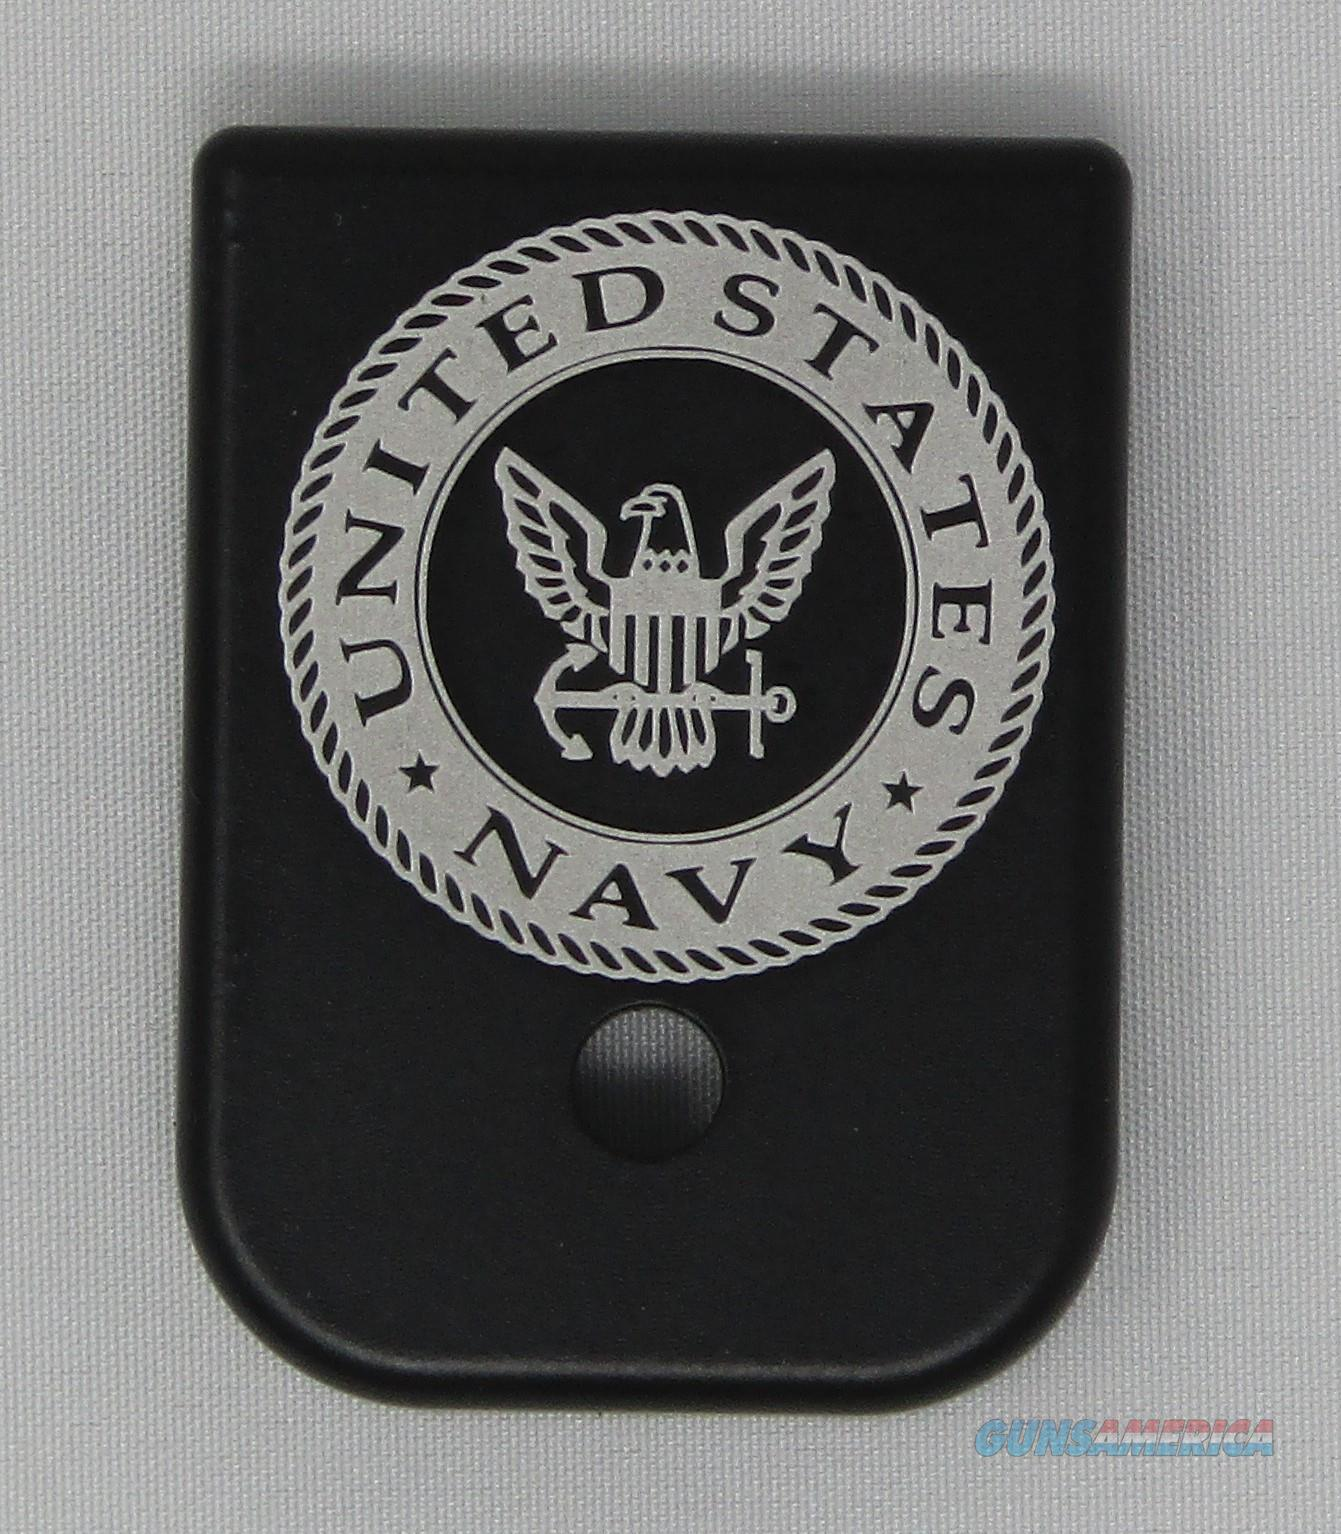 Laser Engraved Glock Mag Base Plate Navy  Non-Guns > Gun Parts > Misc > Pistols